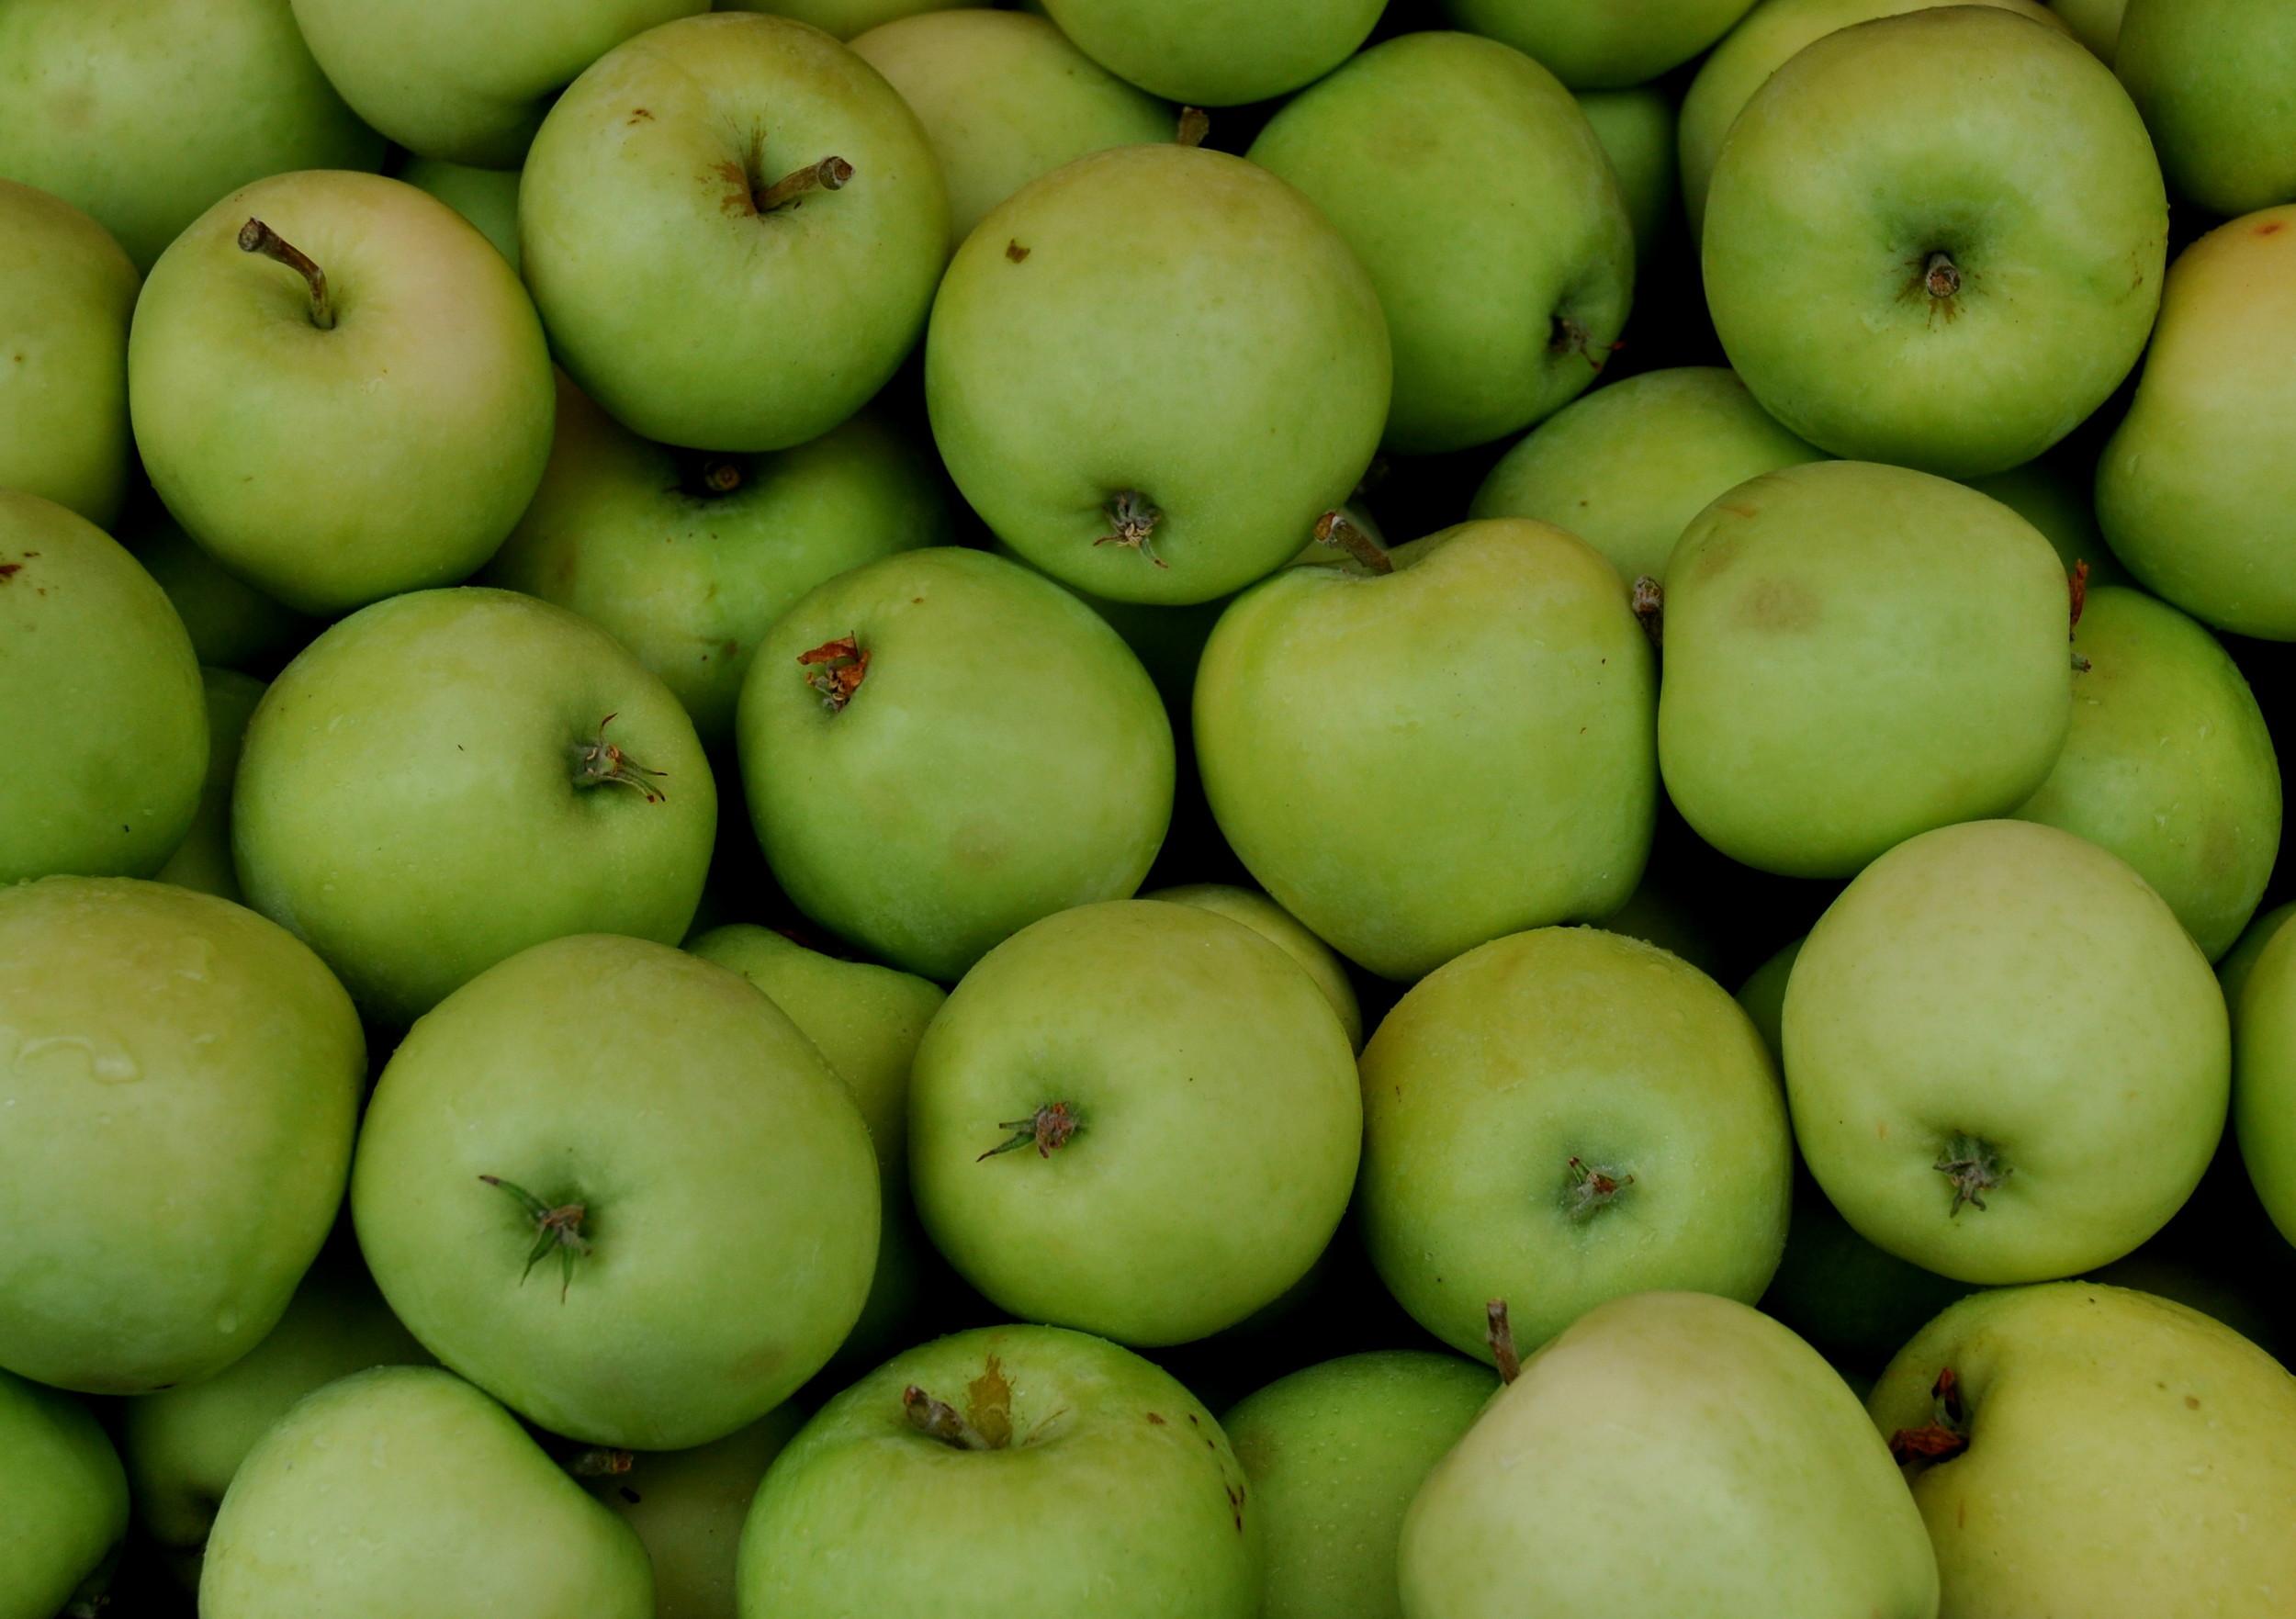 Shamrock apples from Tiny's Organic Produce. Photo copyright 2013 by Zachary D. Lyons.